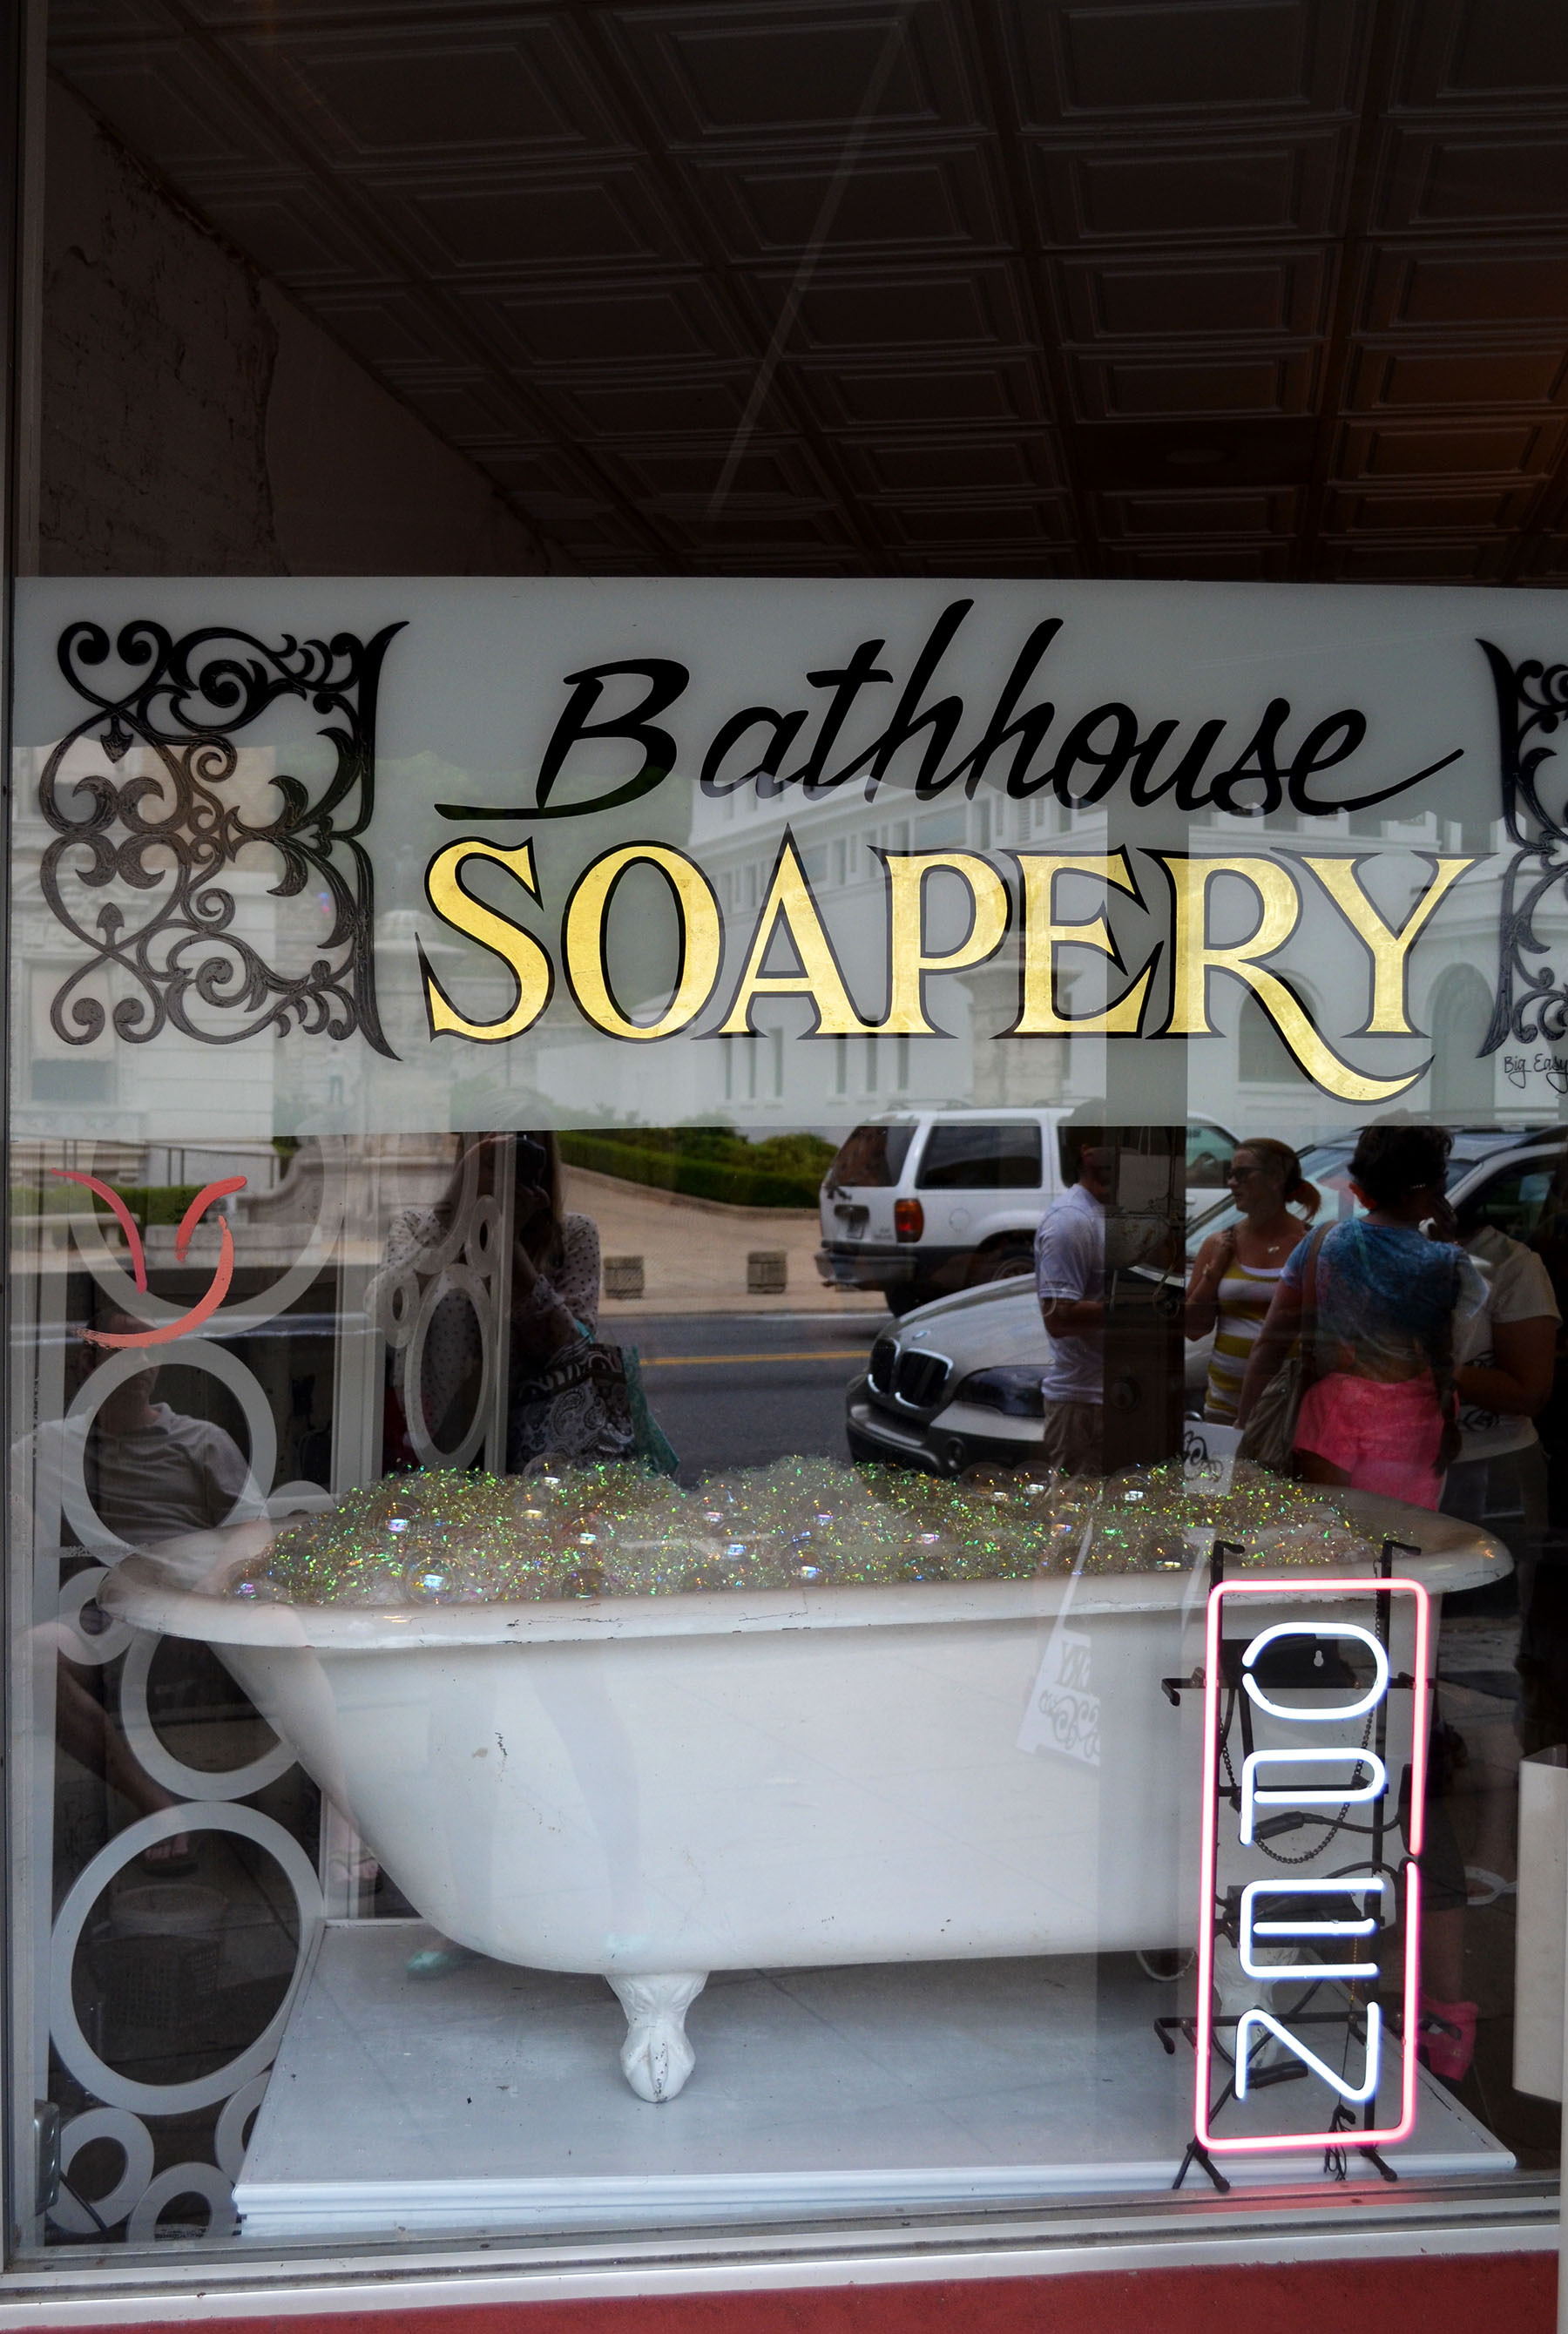 Bathhouse Soapery